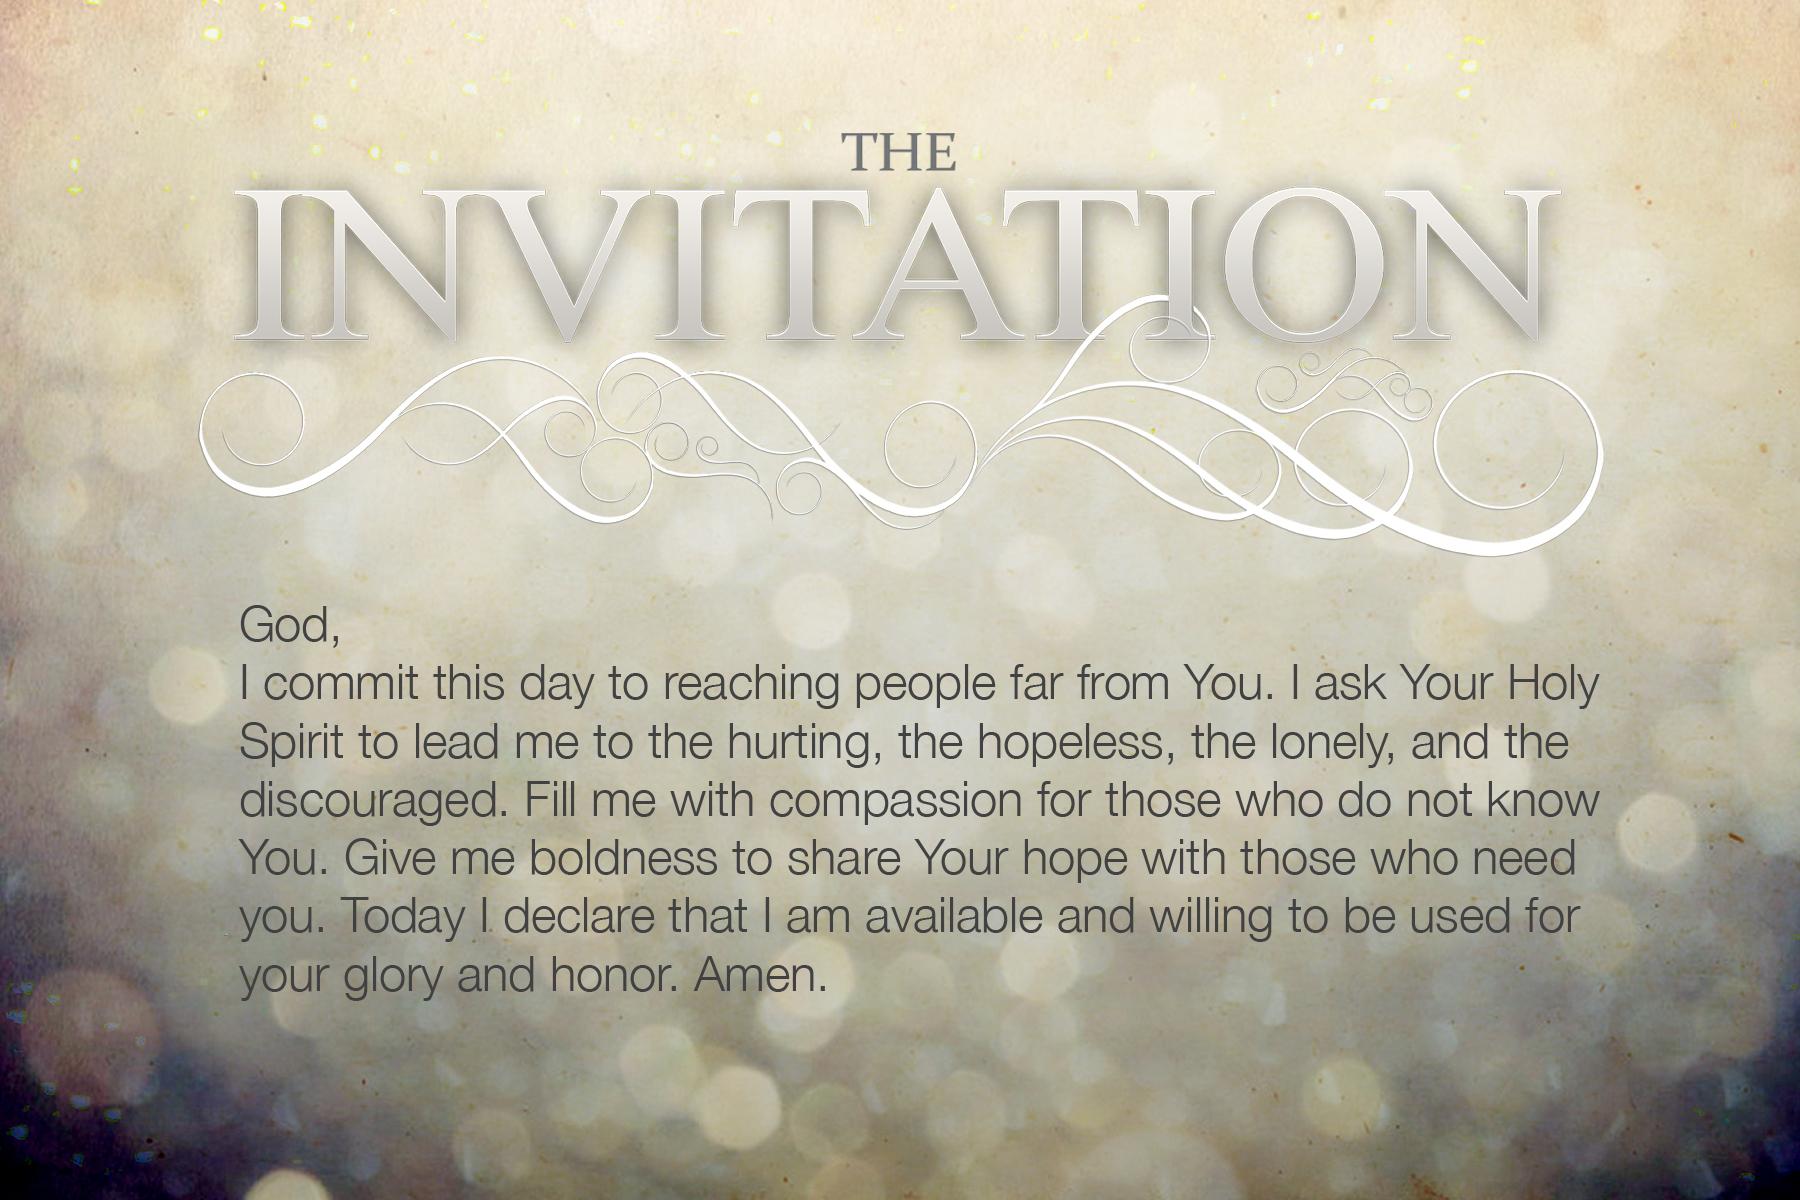 Oriah Invitation is adorable invitations layout